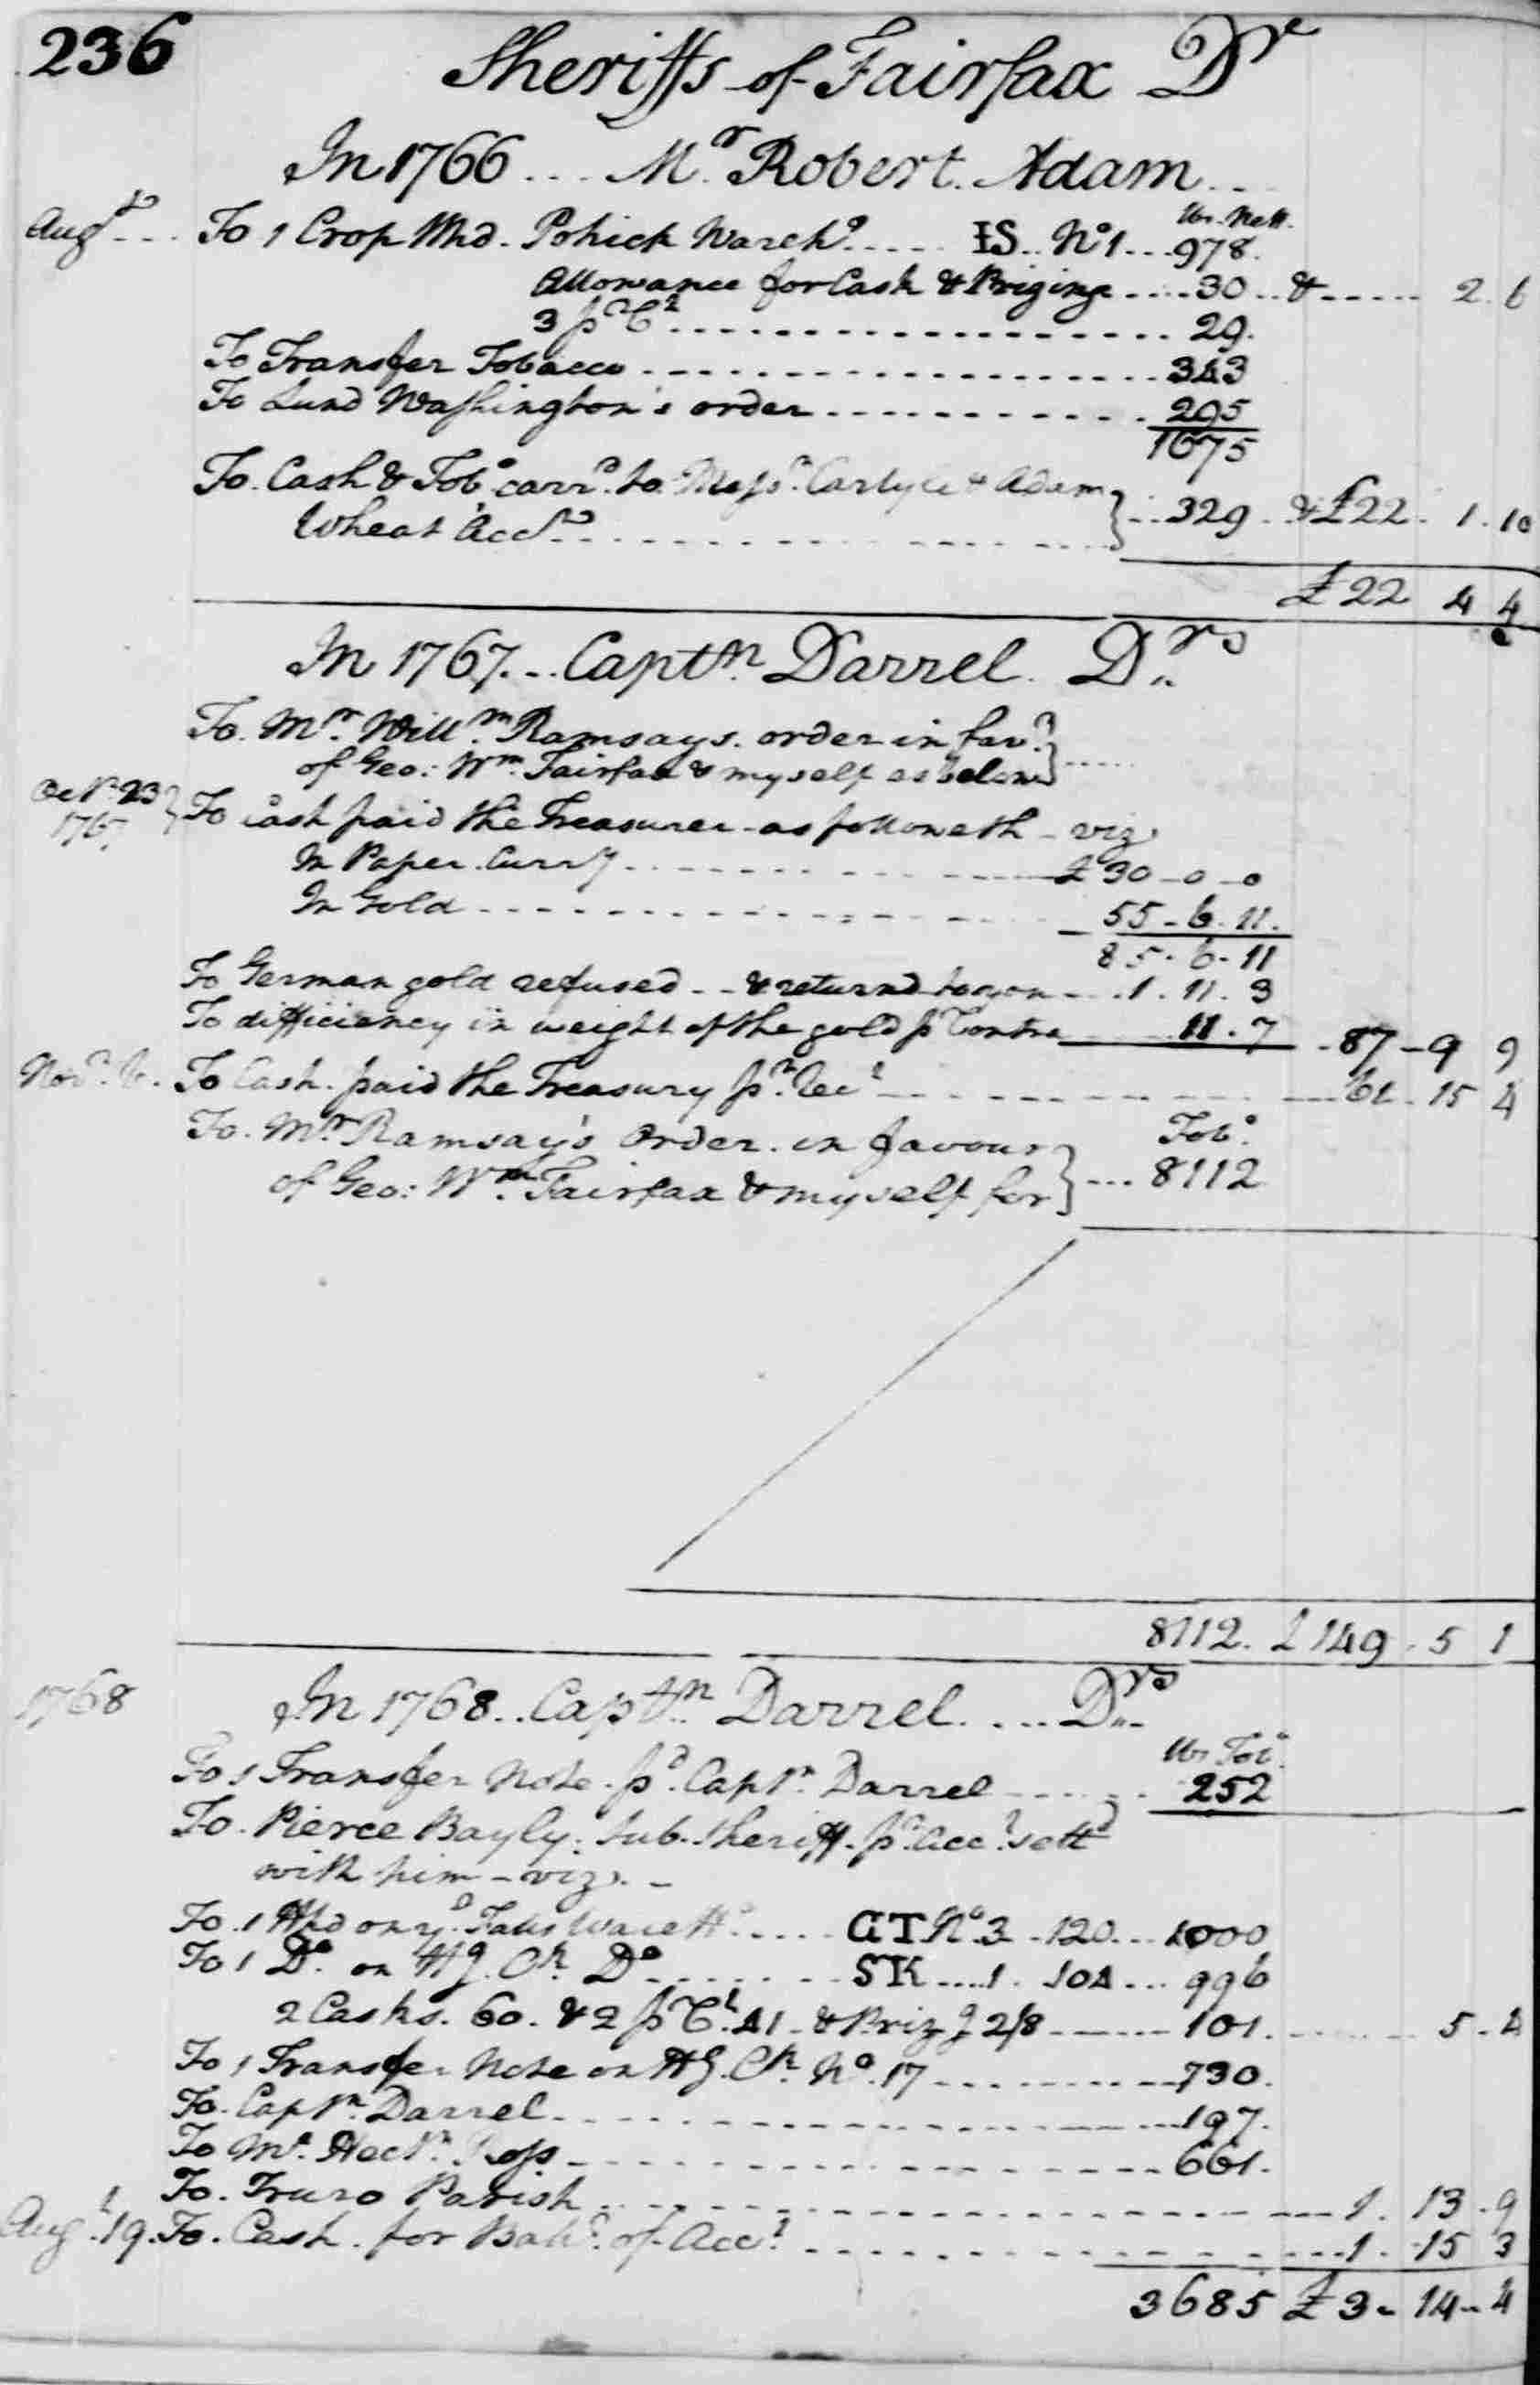 Ledger A, folio 236, left side